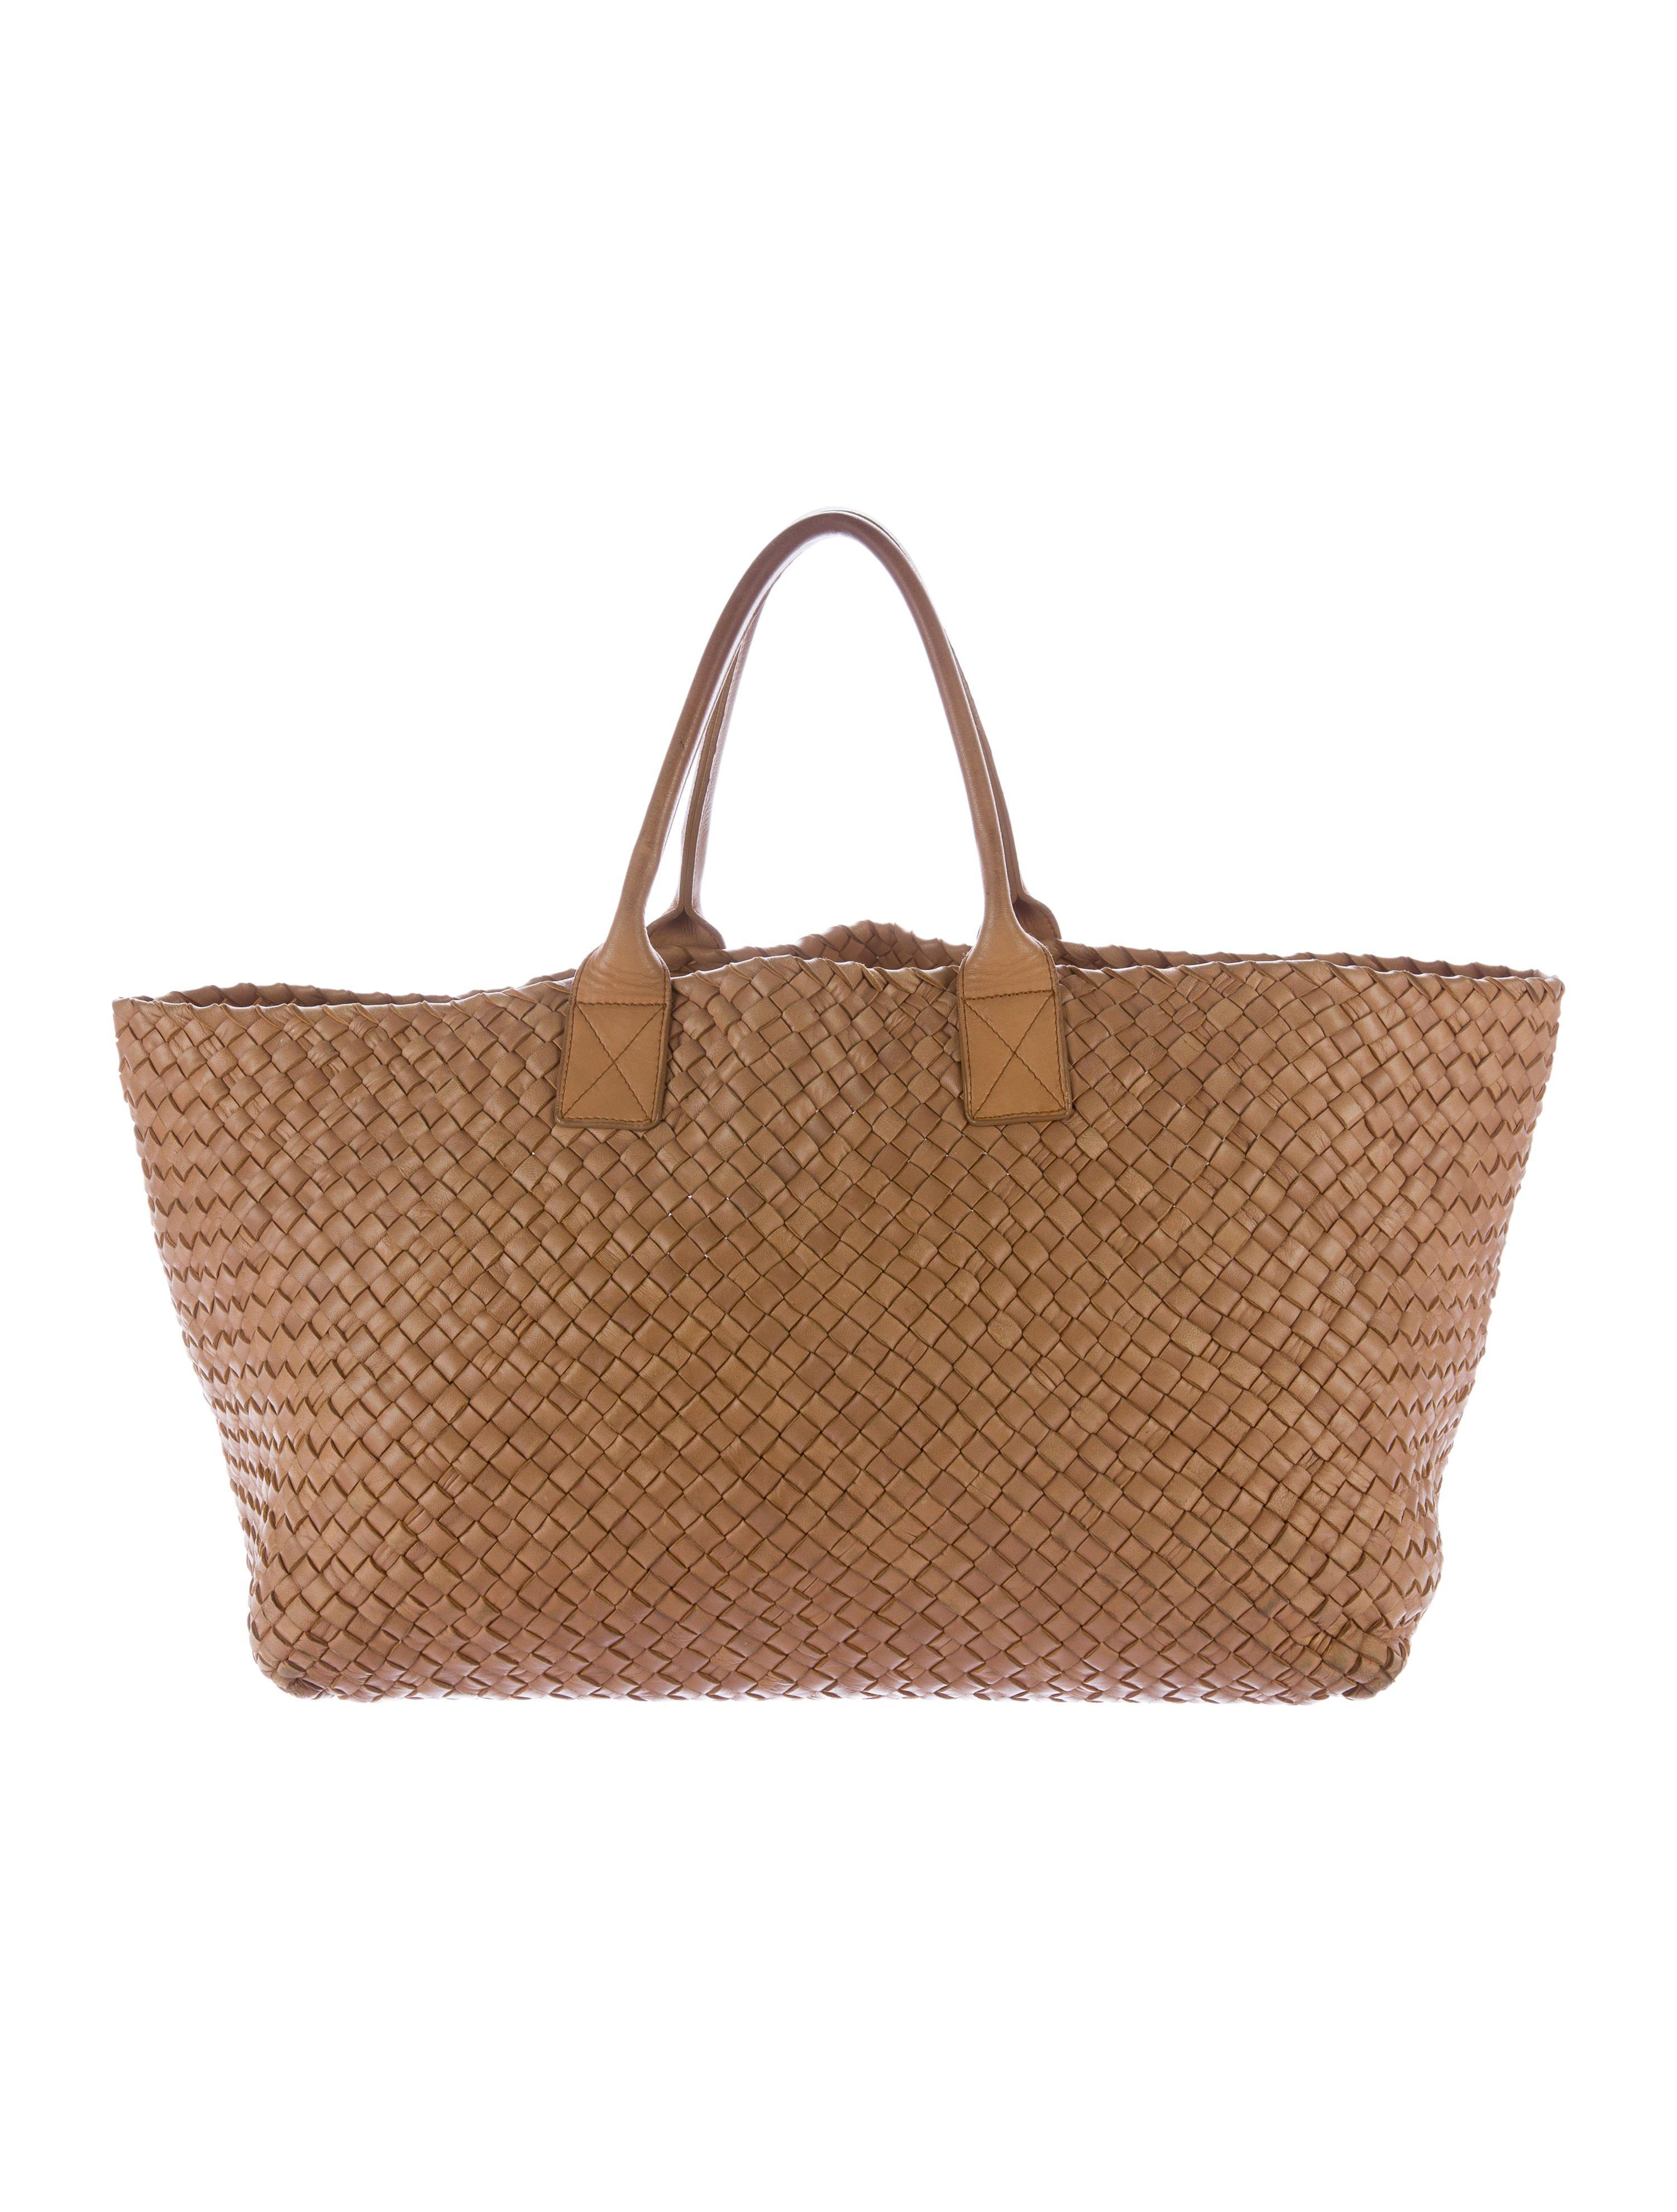 Shop Bottega Veneta new and pre-owned handbags at The RealReal. Limited  Edition. Brown Intrecciato leather Bottega Veneta Large Cabat ... b0552d40325f9